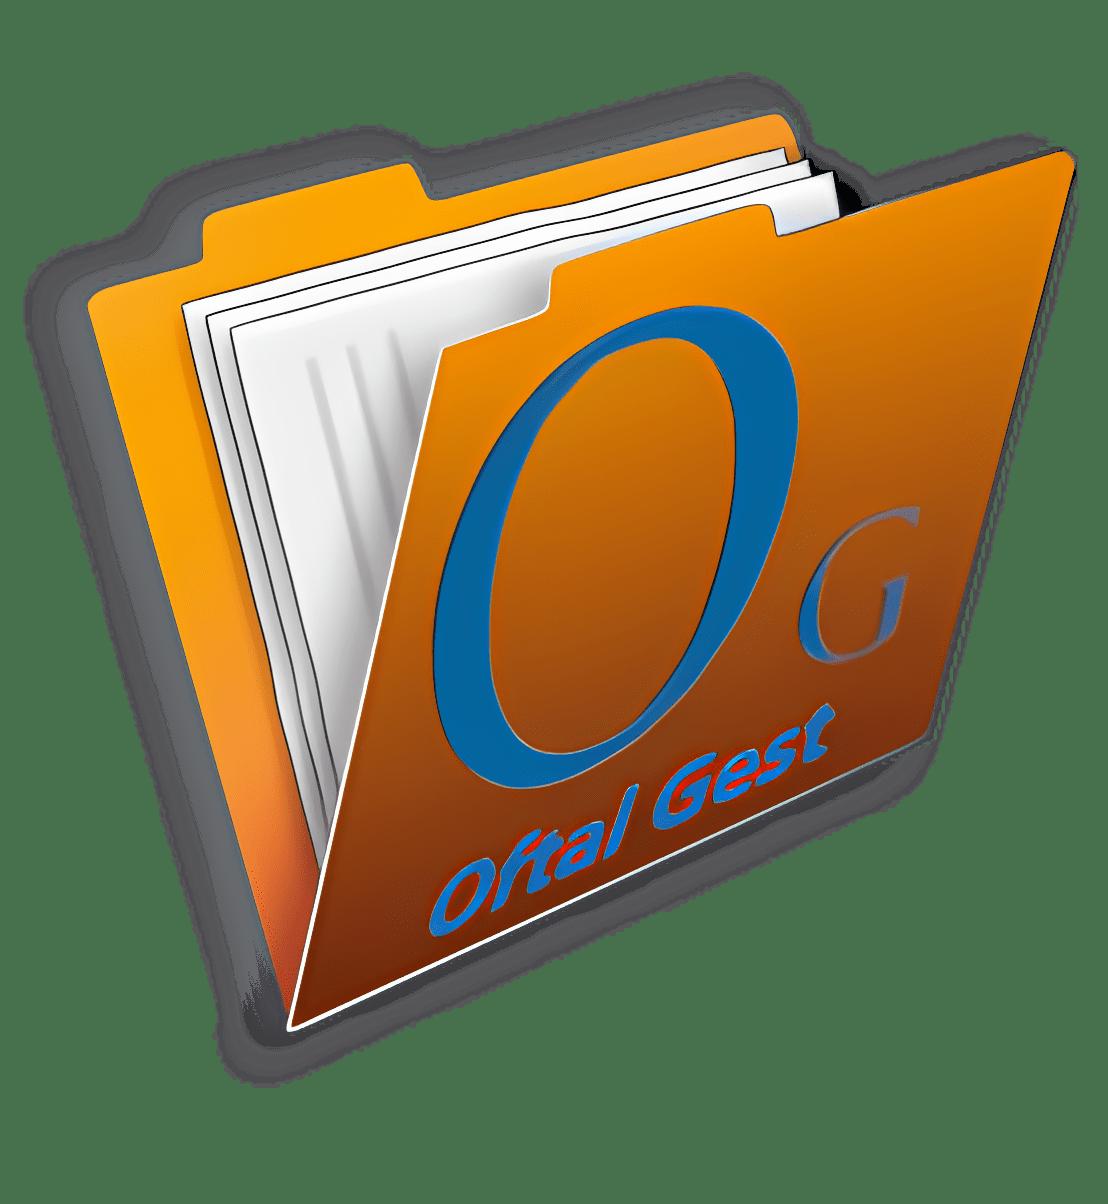 OftalGest 1.6